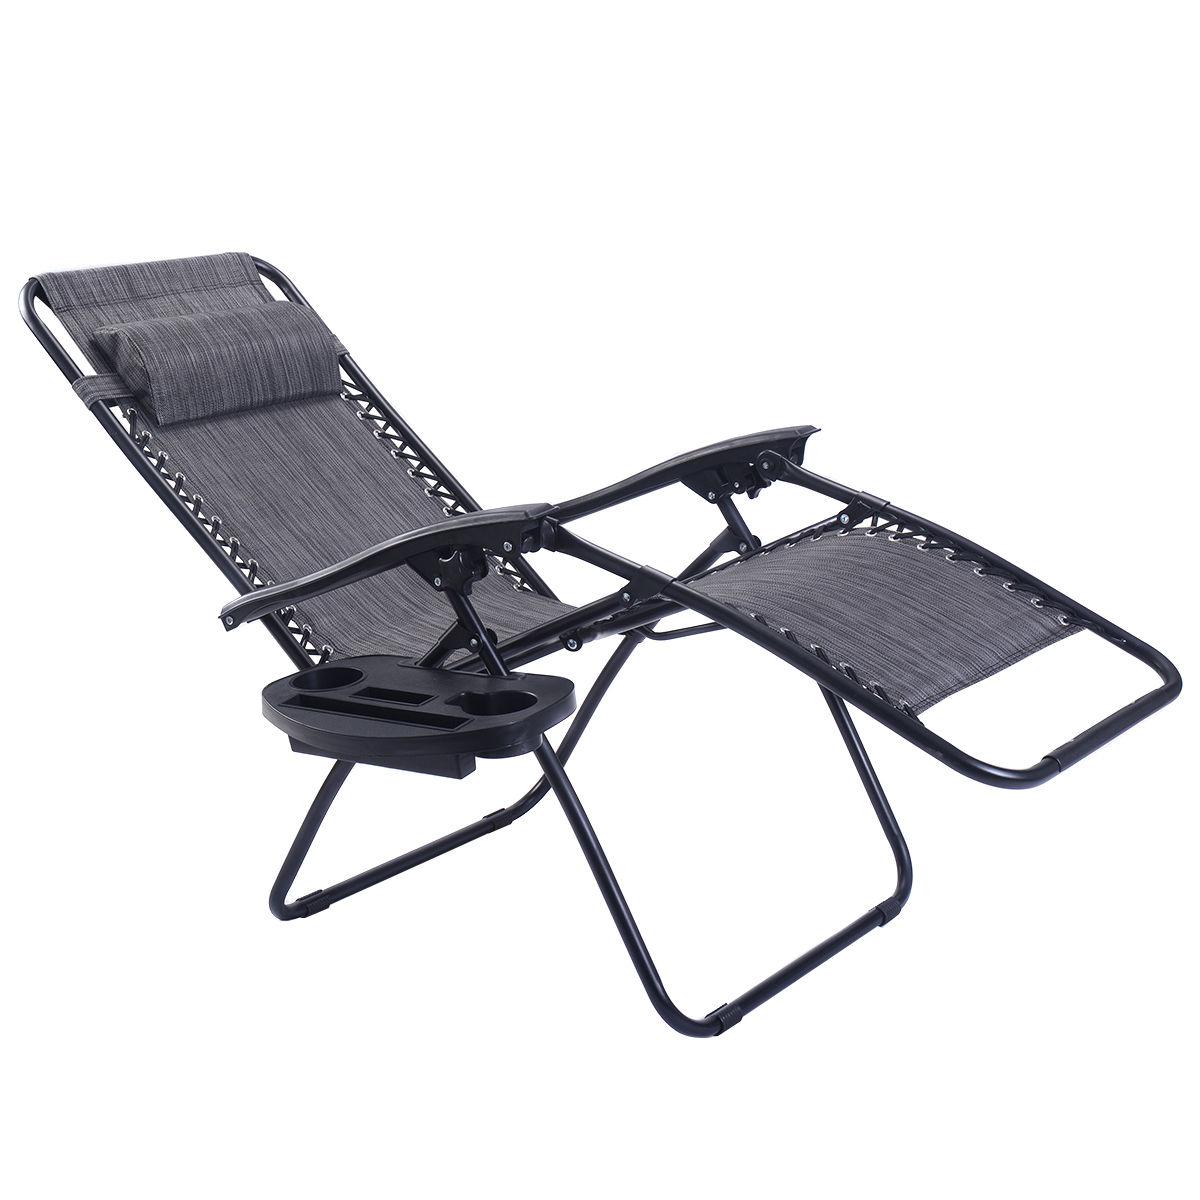 2PC Folding Zero Gravity Reclining Lounge Chairs Beach Patio W/ Utility Tray - image 7 of 8